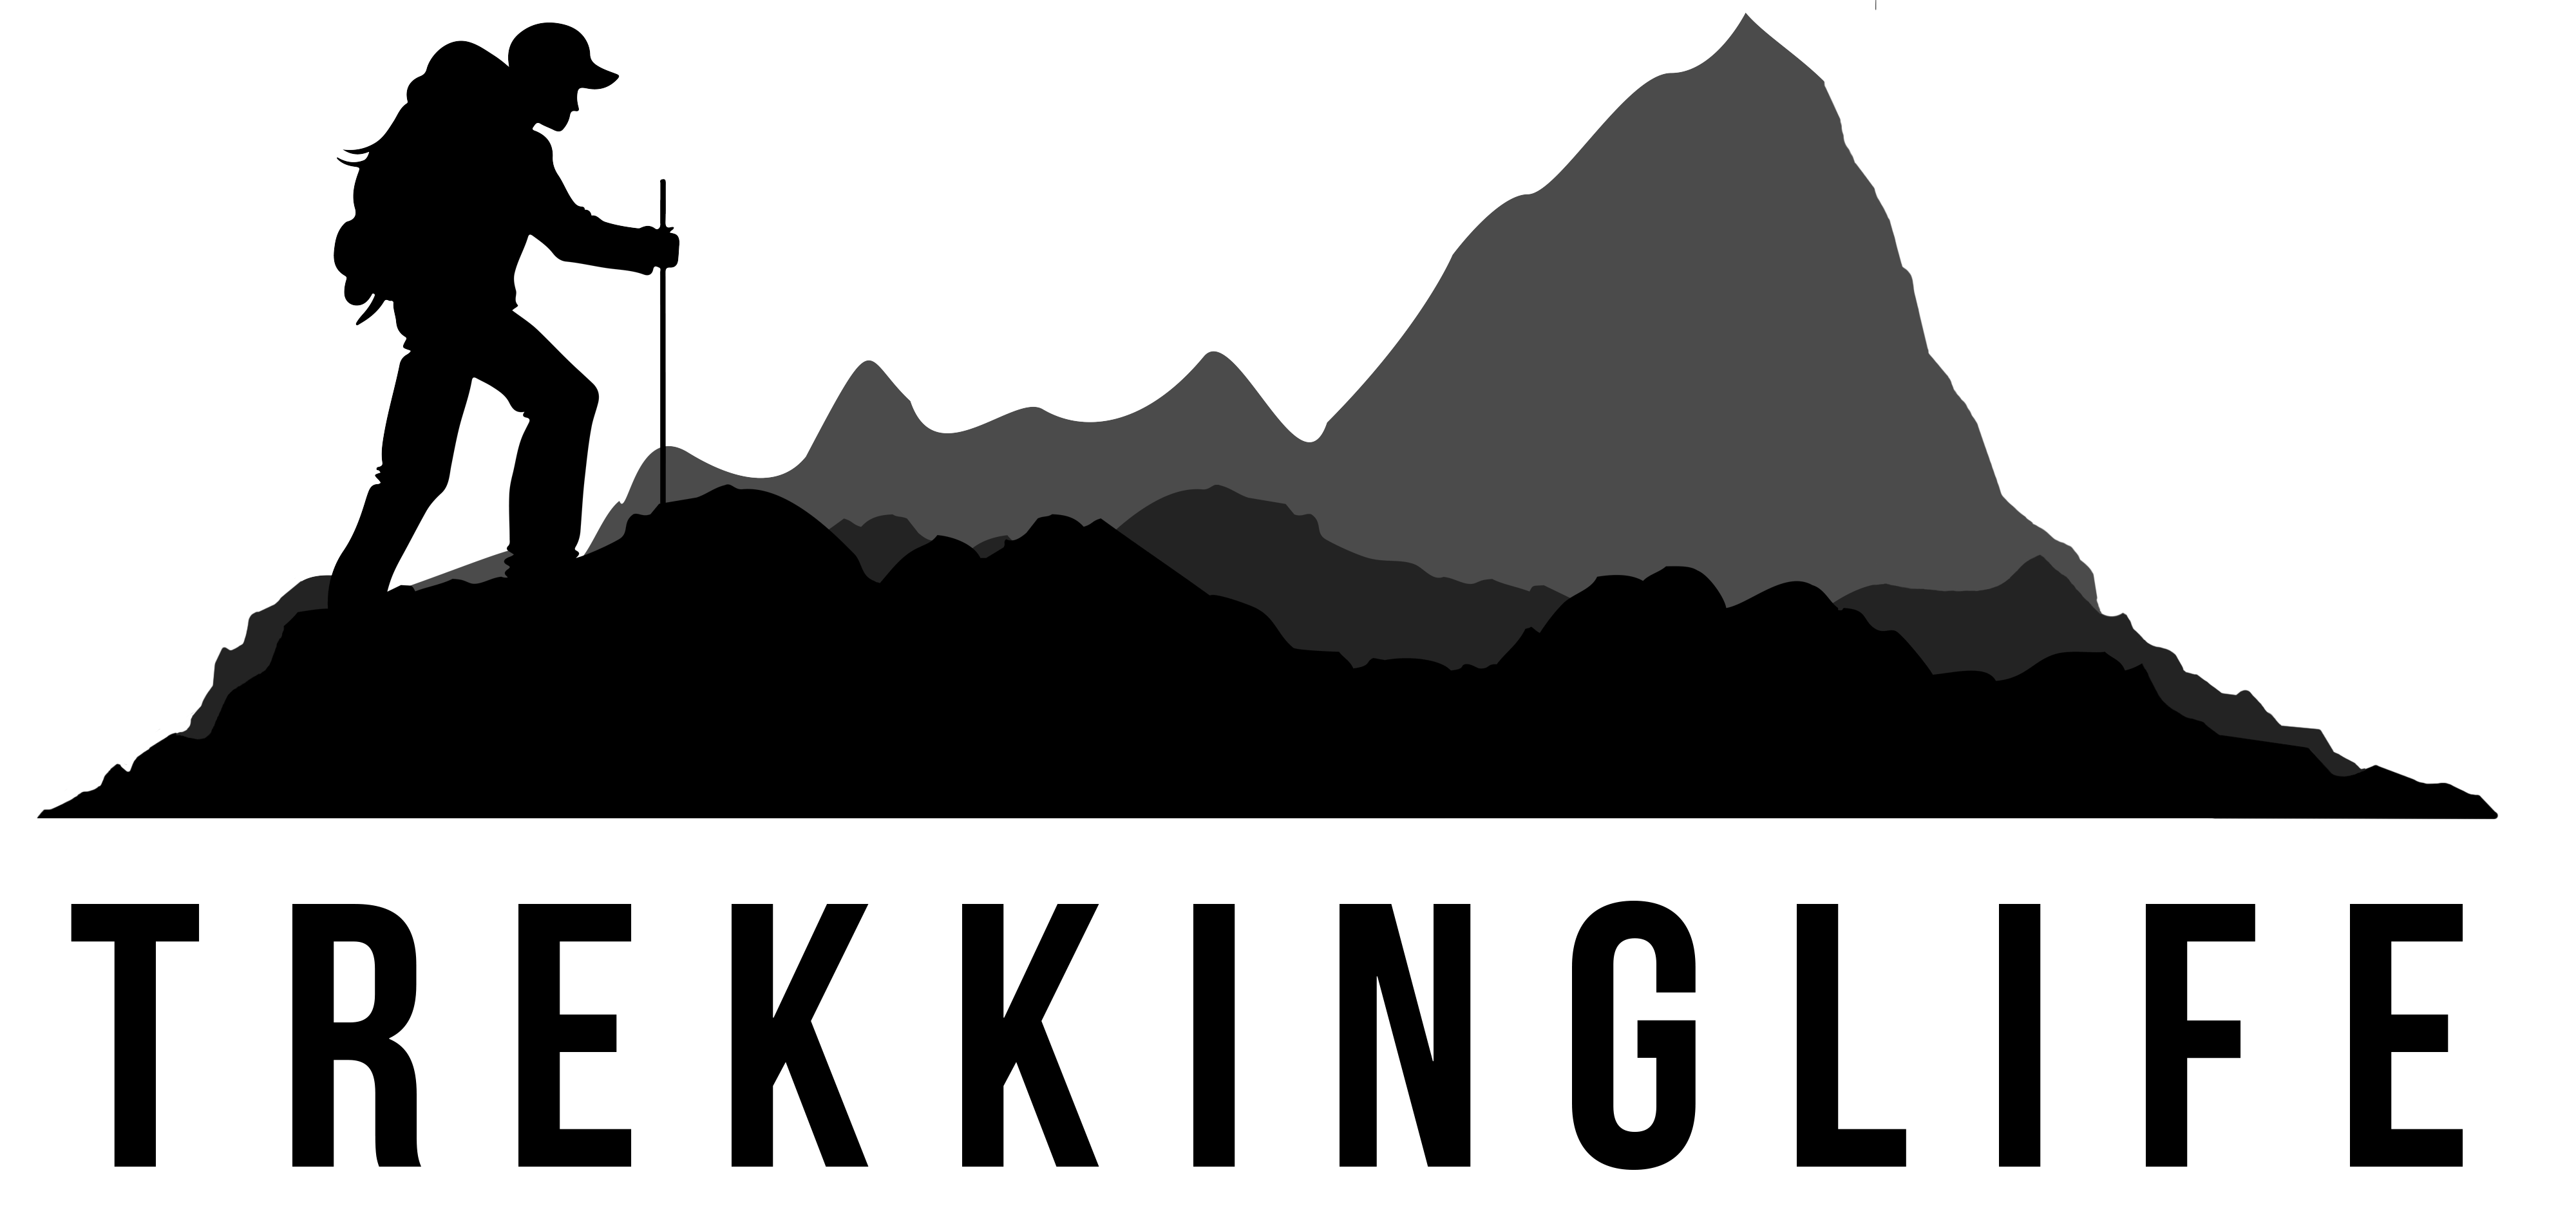 trekkinglife – draußen zuhause | Outdoorblog | Wanderblog